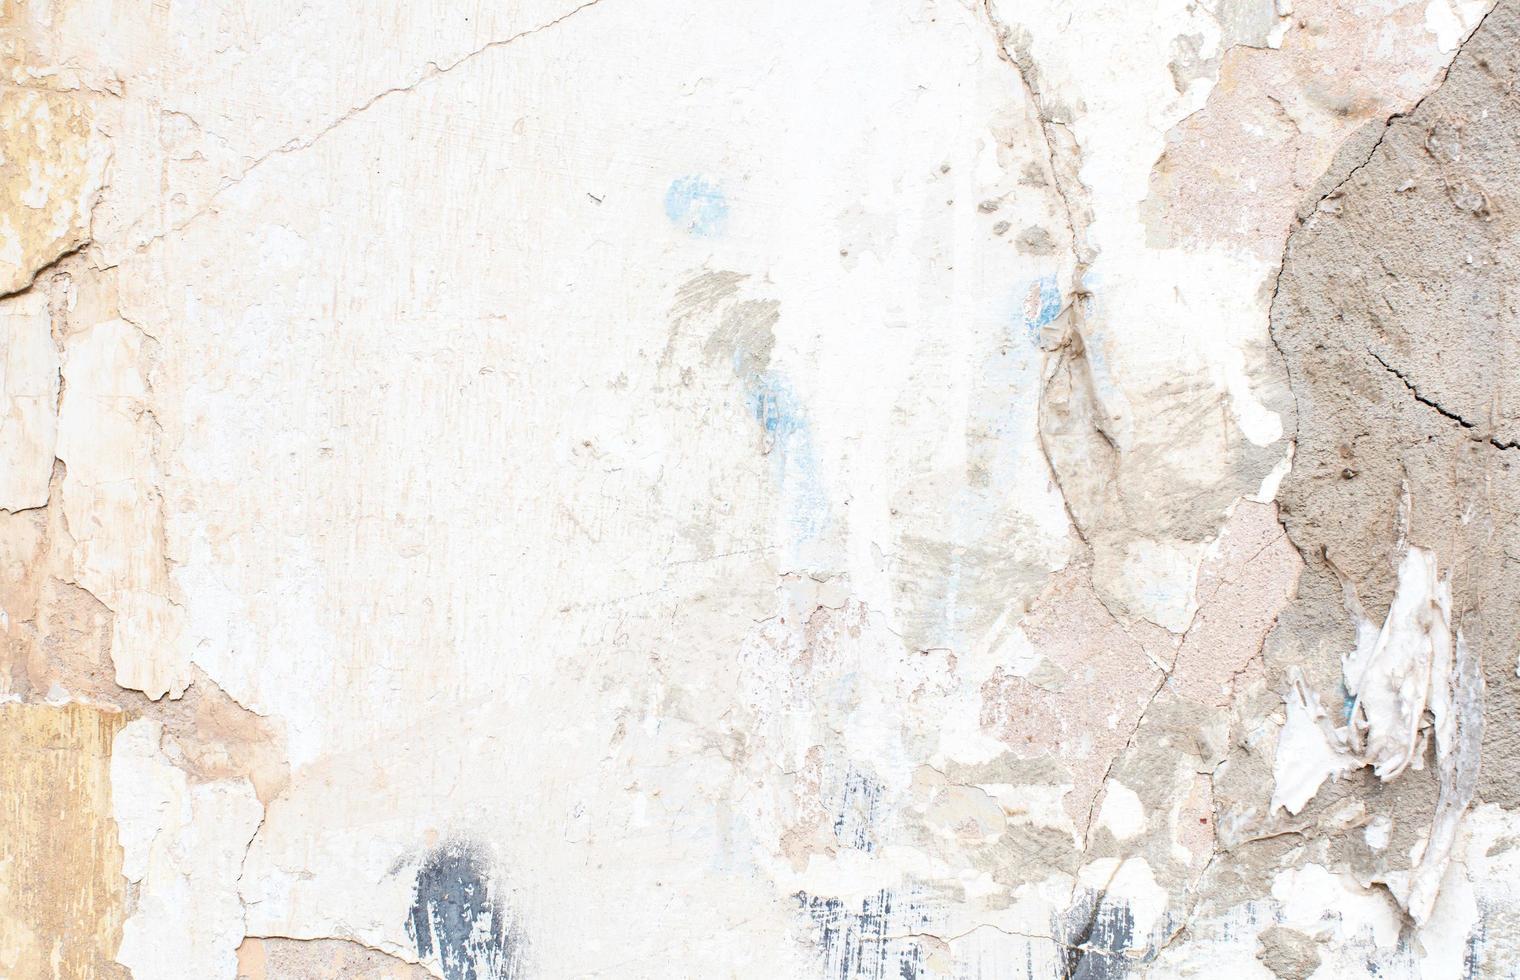 textura de tinta lascada foto